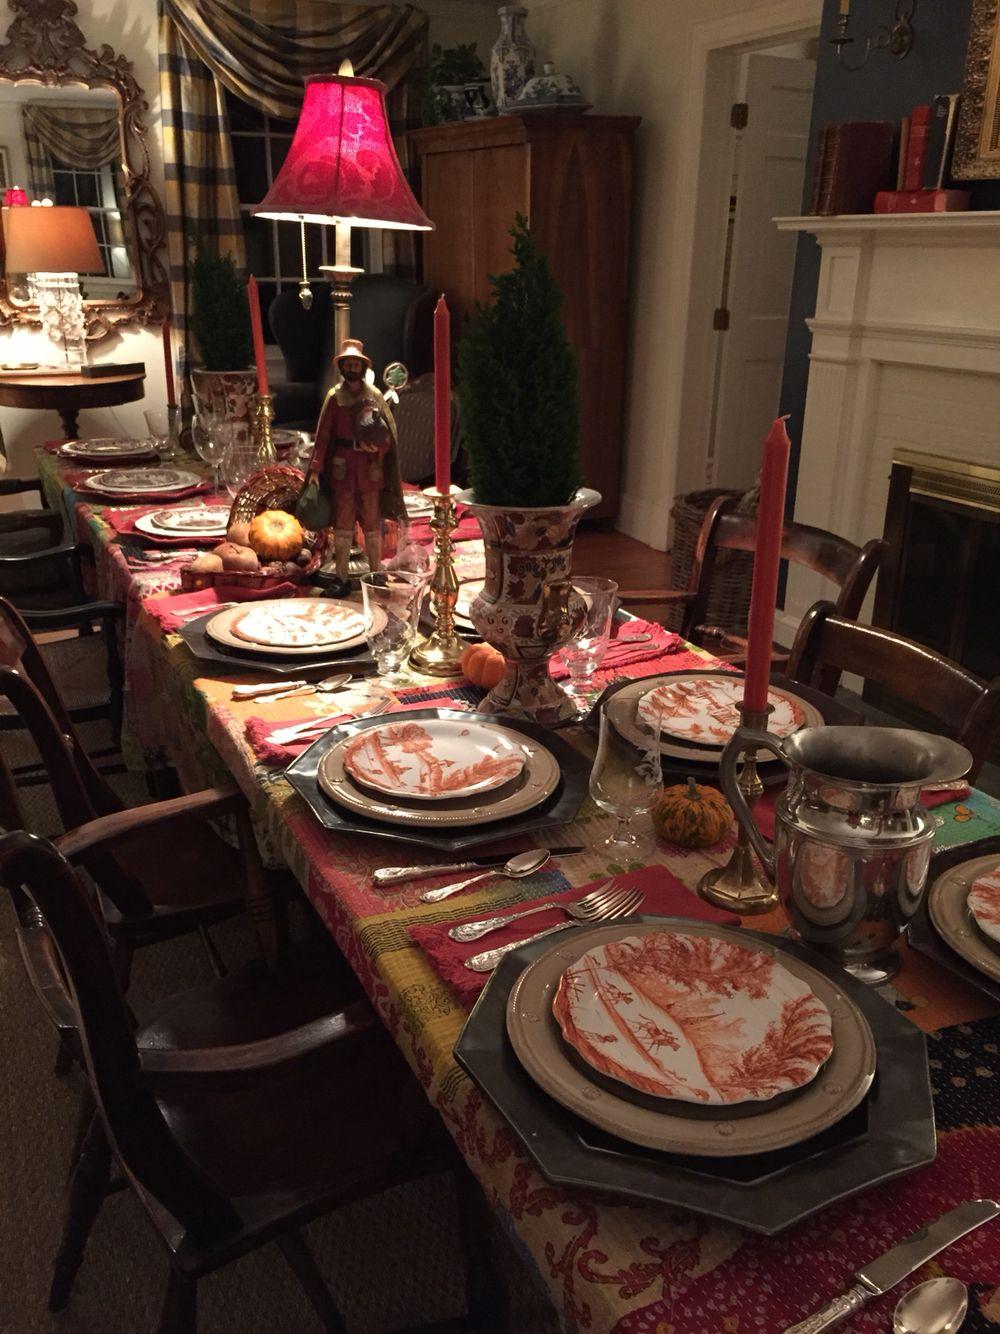 thanksgiving table juliska pewter chargers bt plates pumpkin country estate salad plates - Thanksgiving Table Settings Pinterest